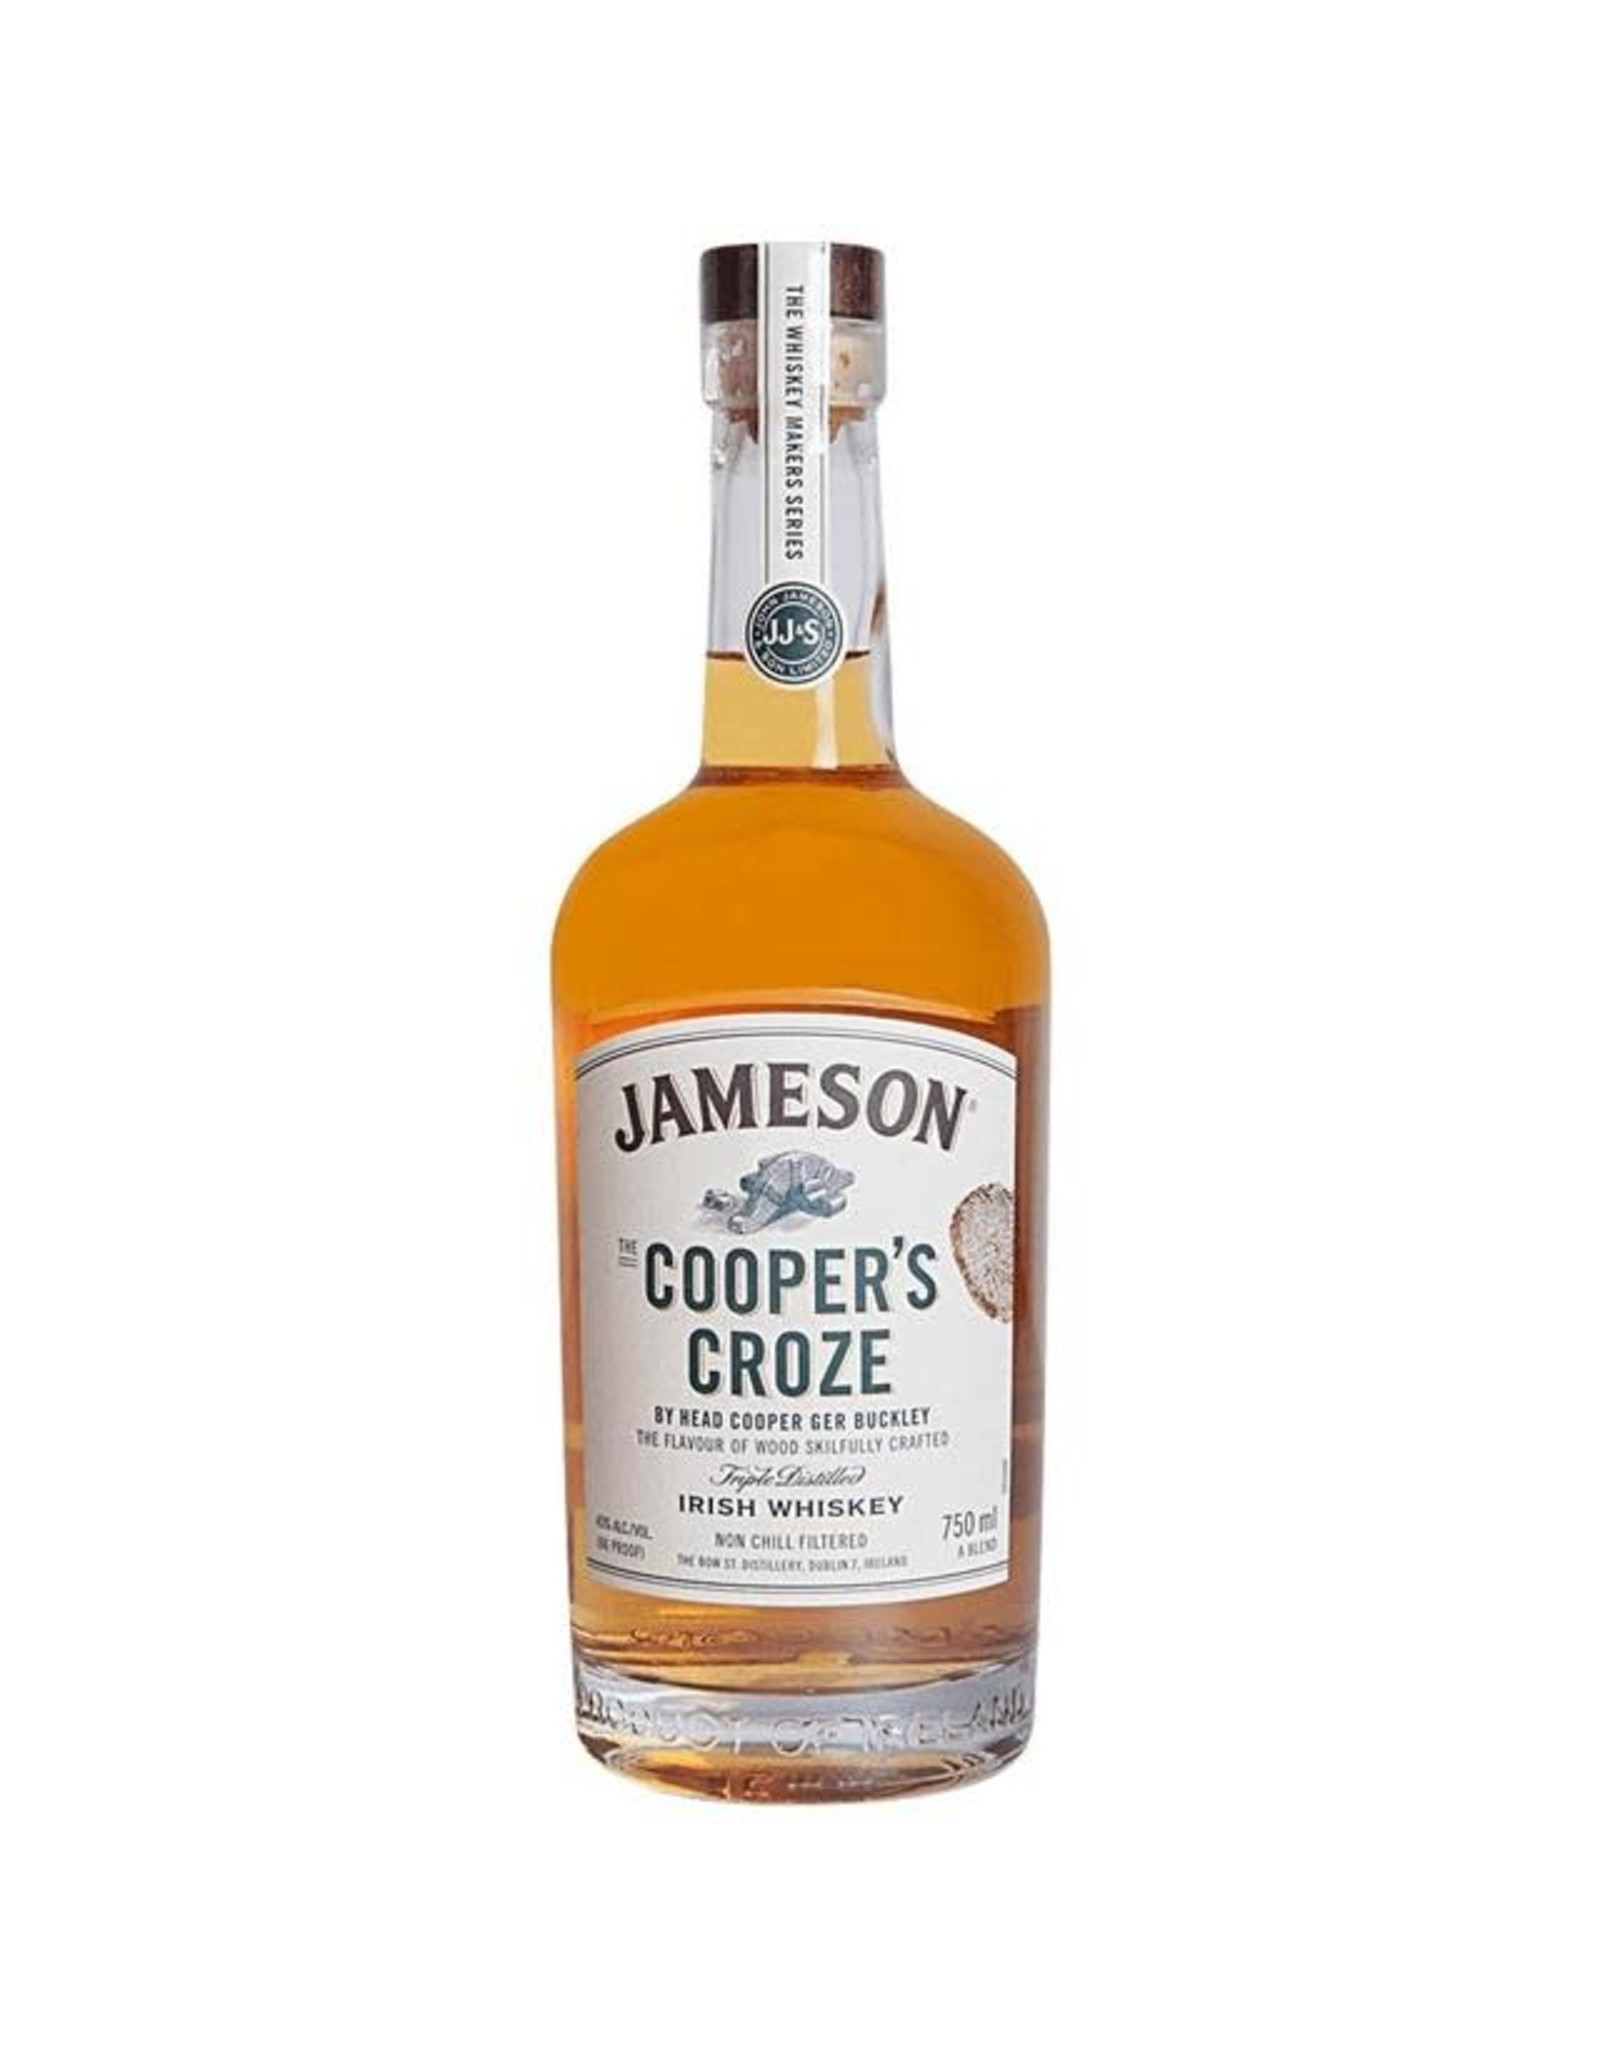 JAMESON COOPERS CROZE 750 ML